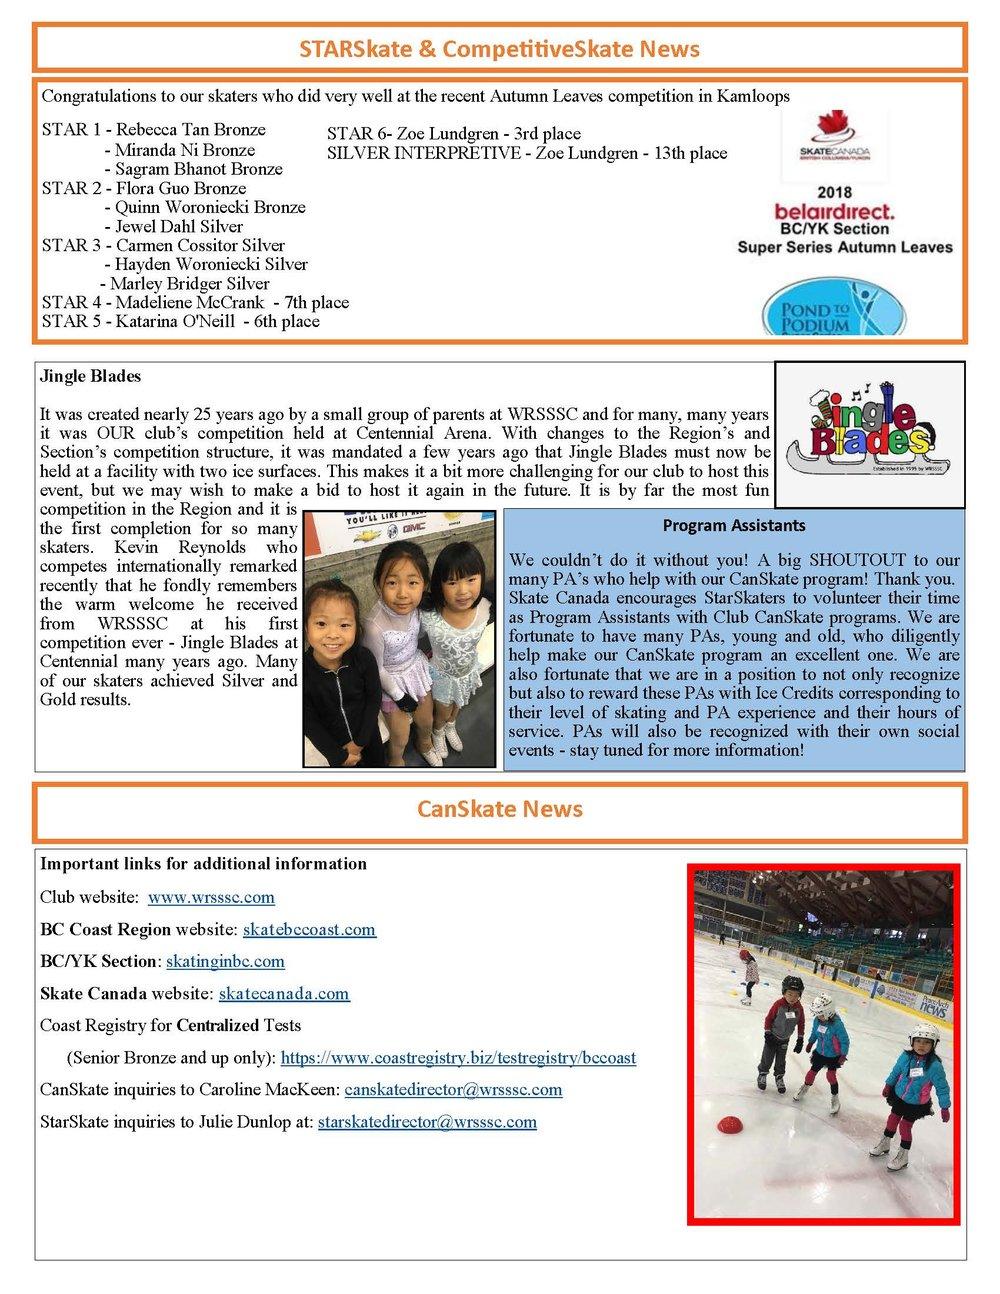 WRSSSC Newsletter December 2018_Page_2.jpg